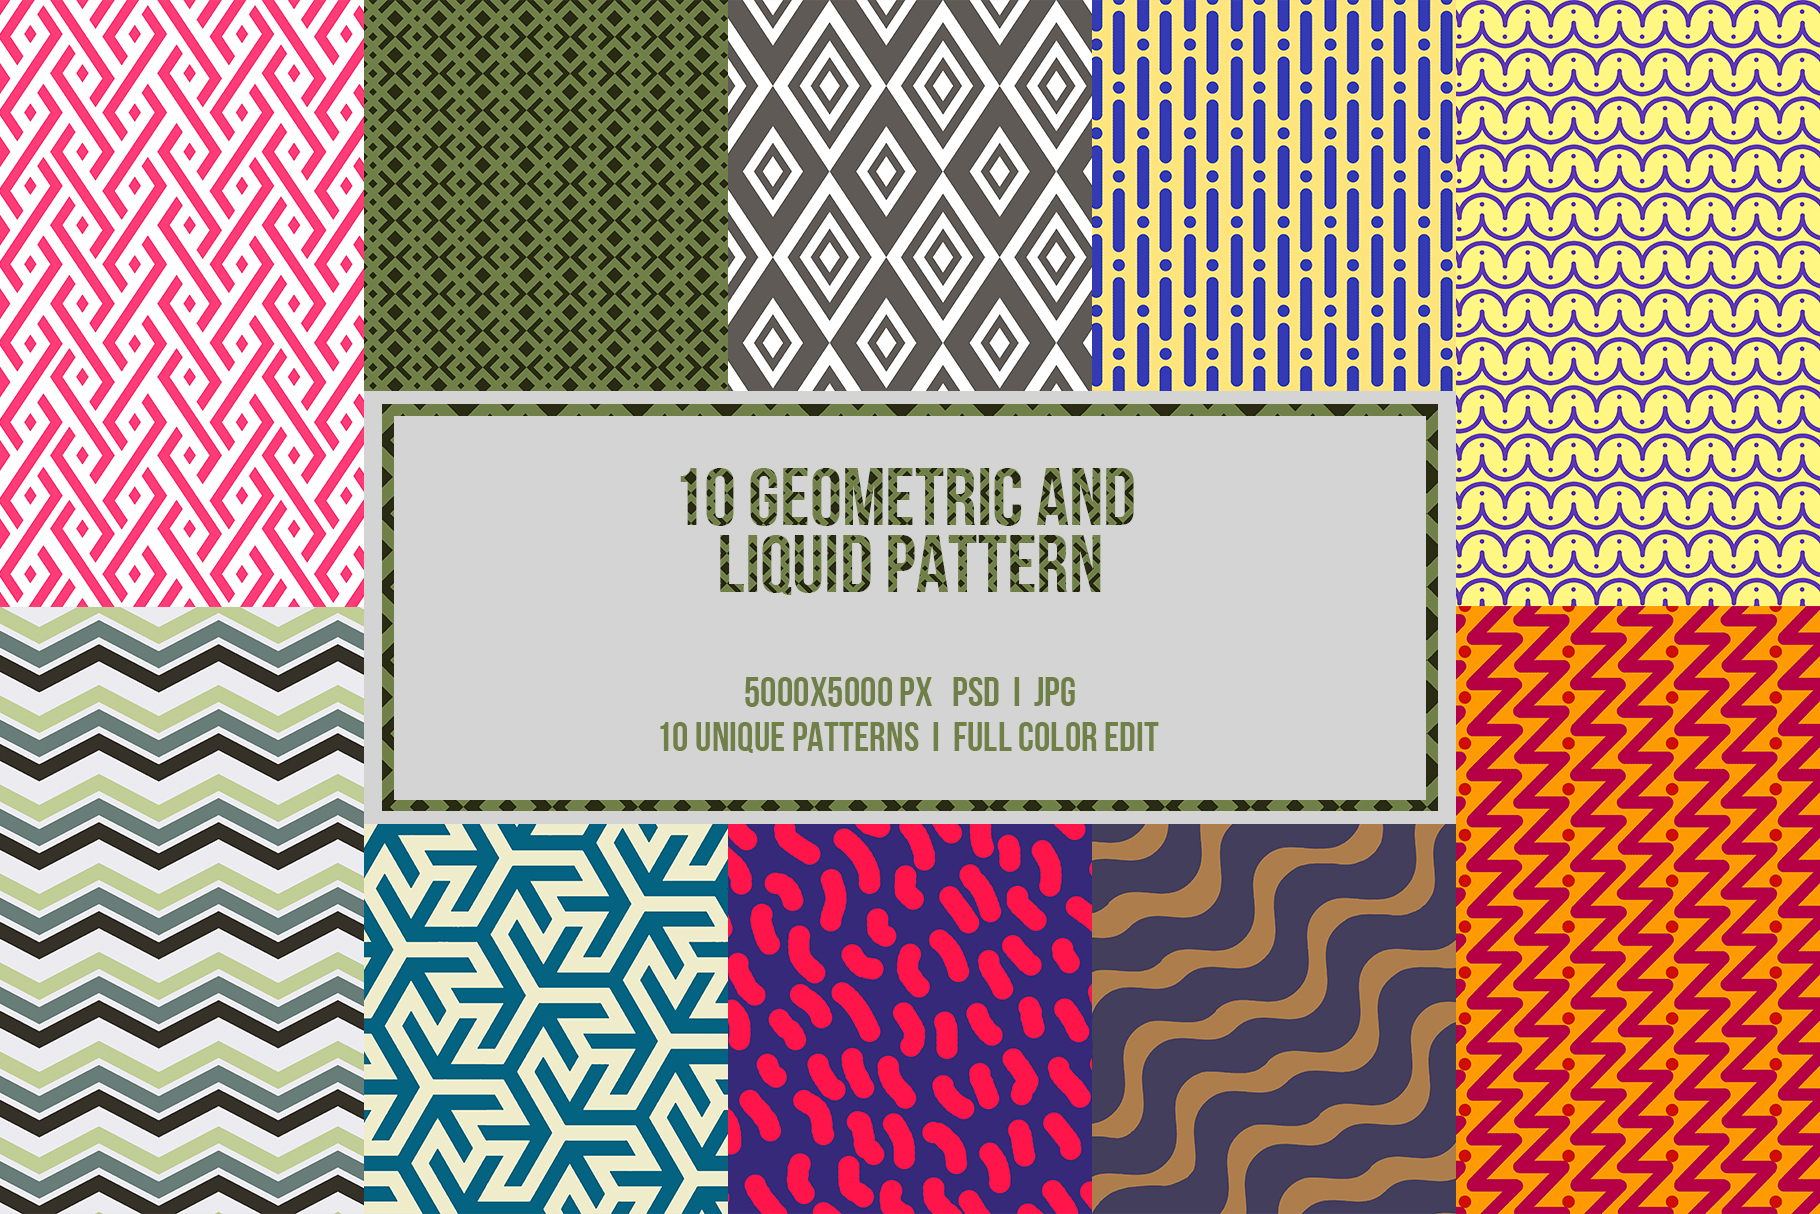 10 Geometric and Liquid Pattern example image 1